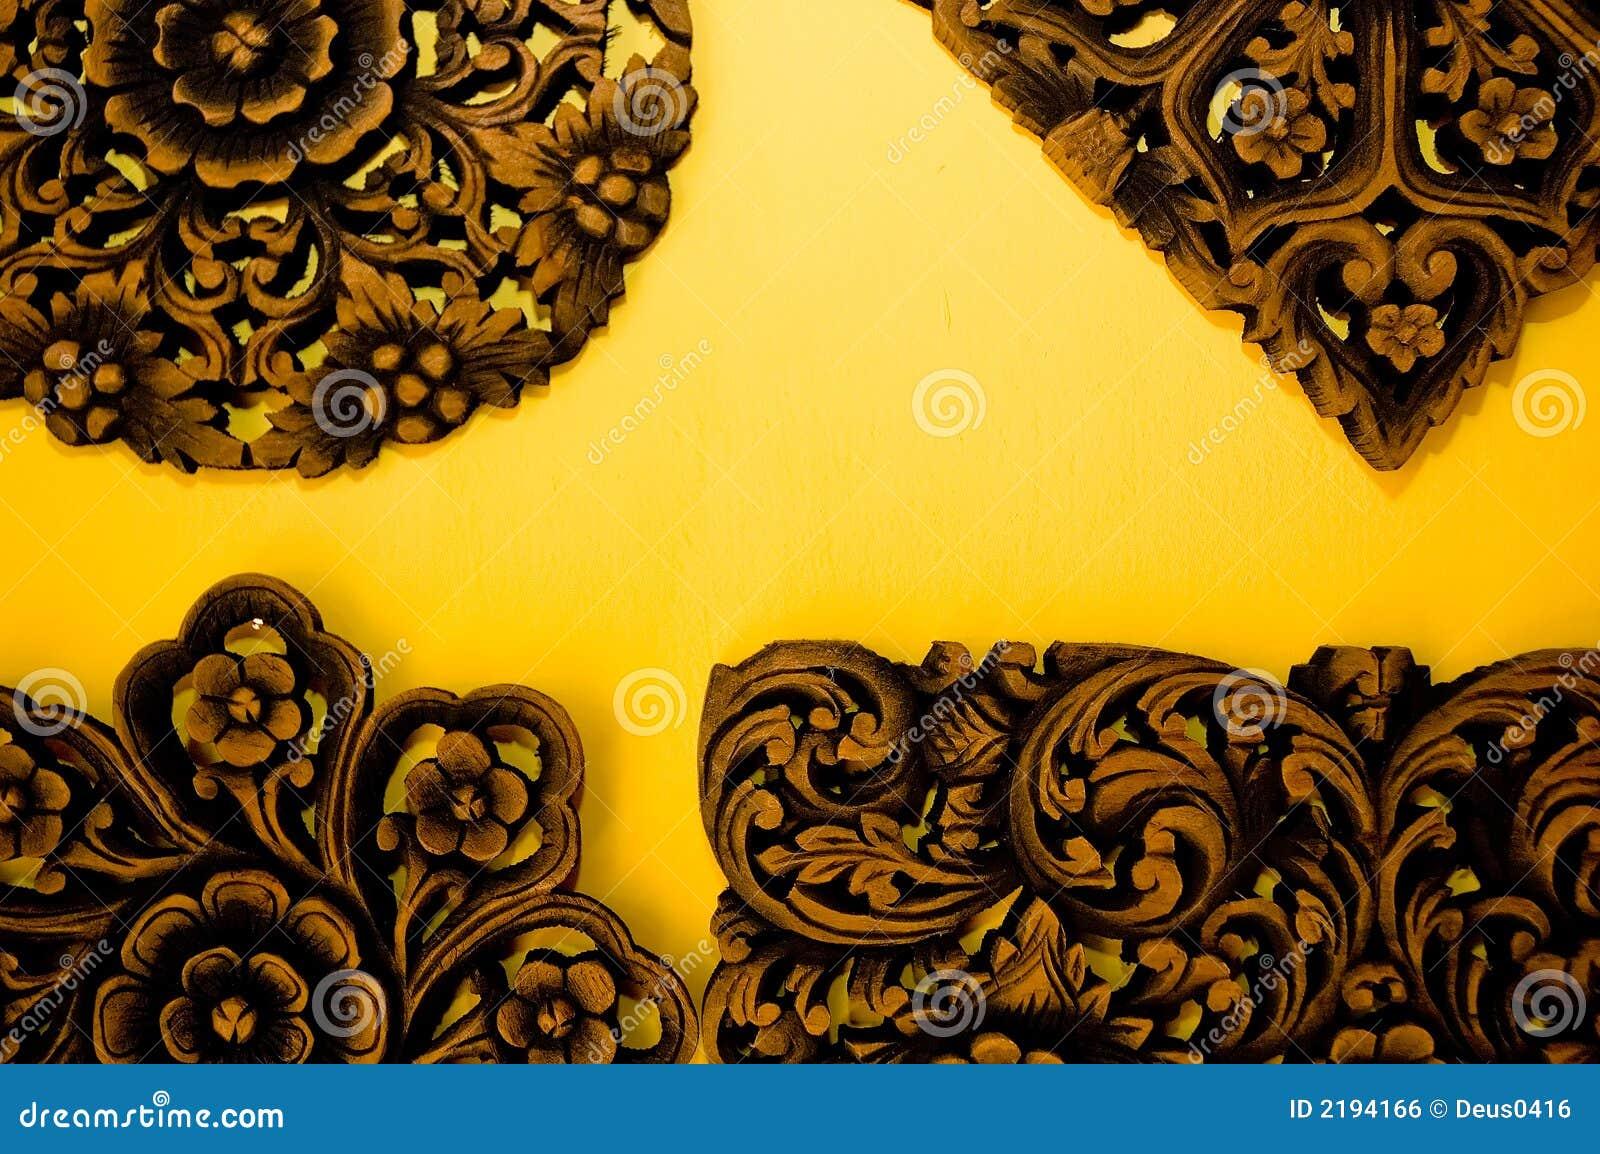 PDF Plans Ebay Wood Carving Download Cabin Design For Offices Aboriginal59lyf